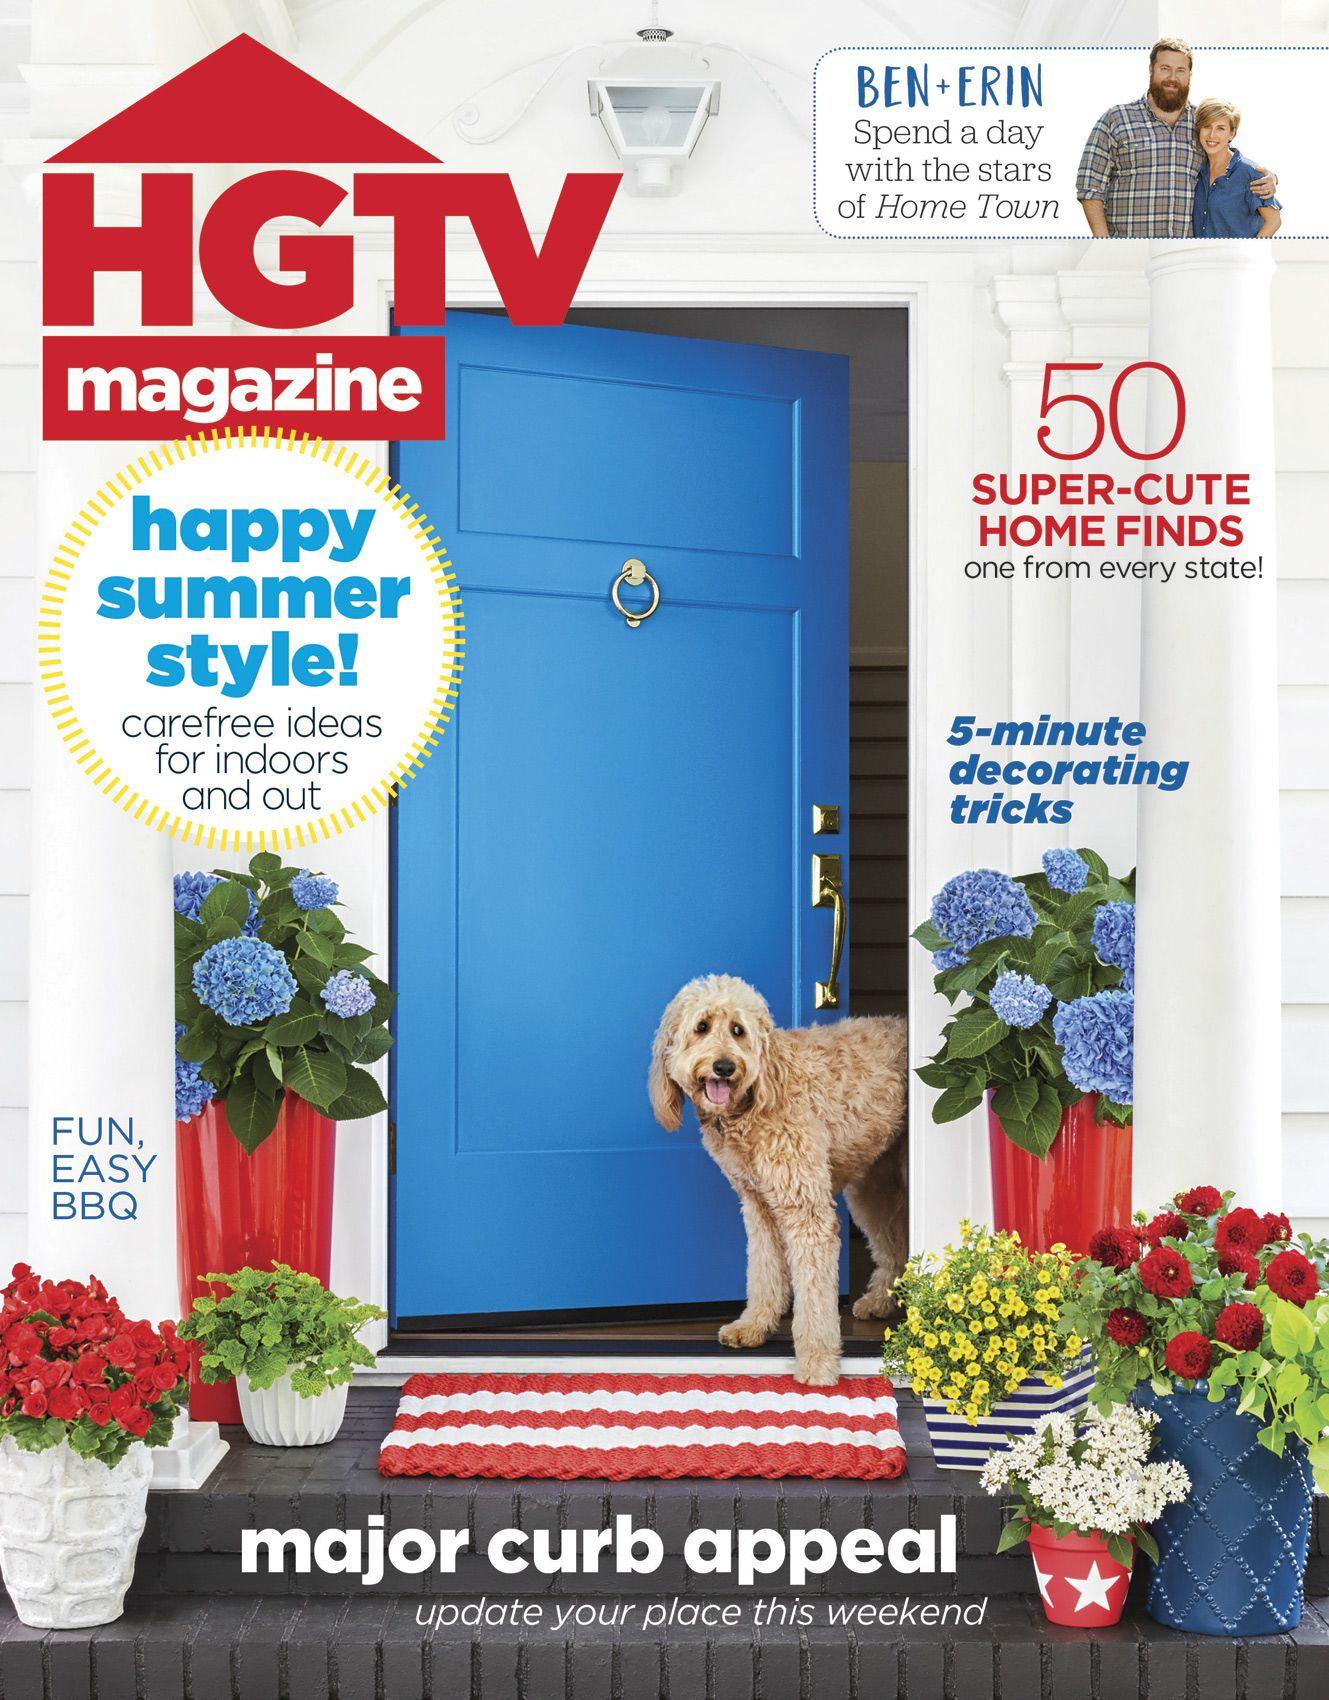 ChristopherWhite-HGTV-Magazine-July-2018-Cover.jpg